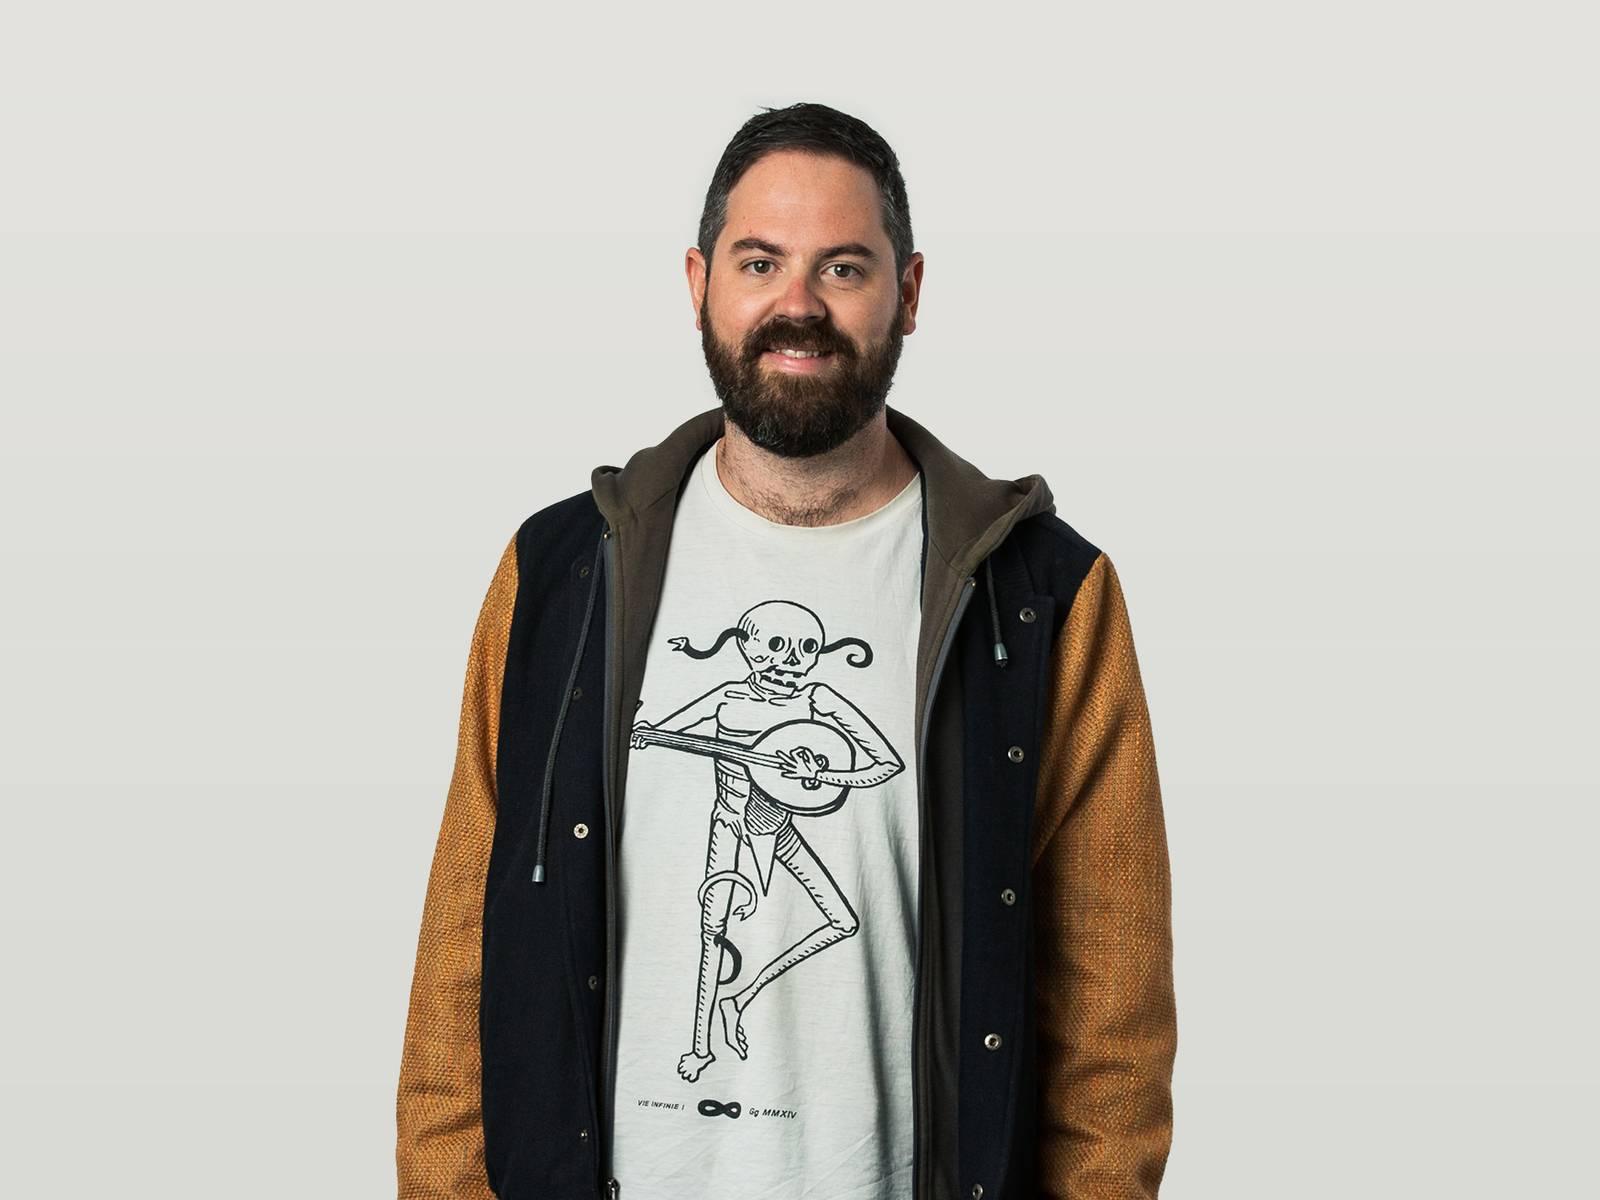 A profile image of Joe Garlick